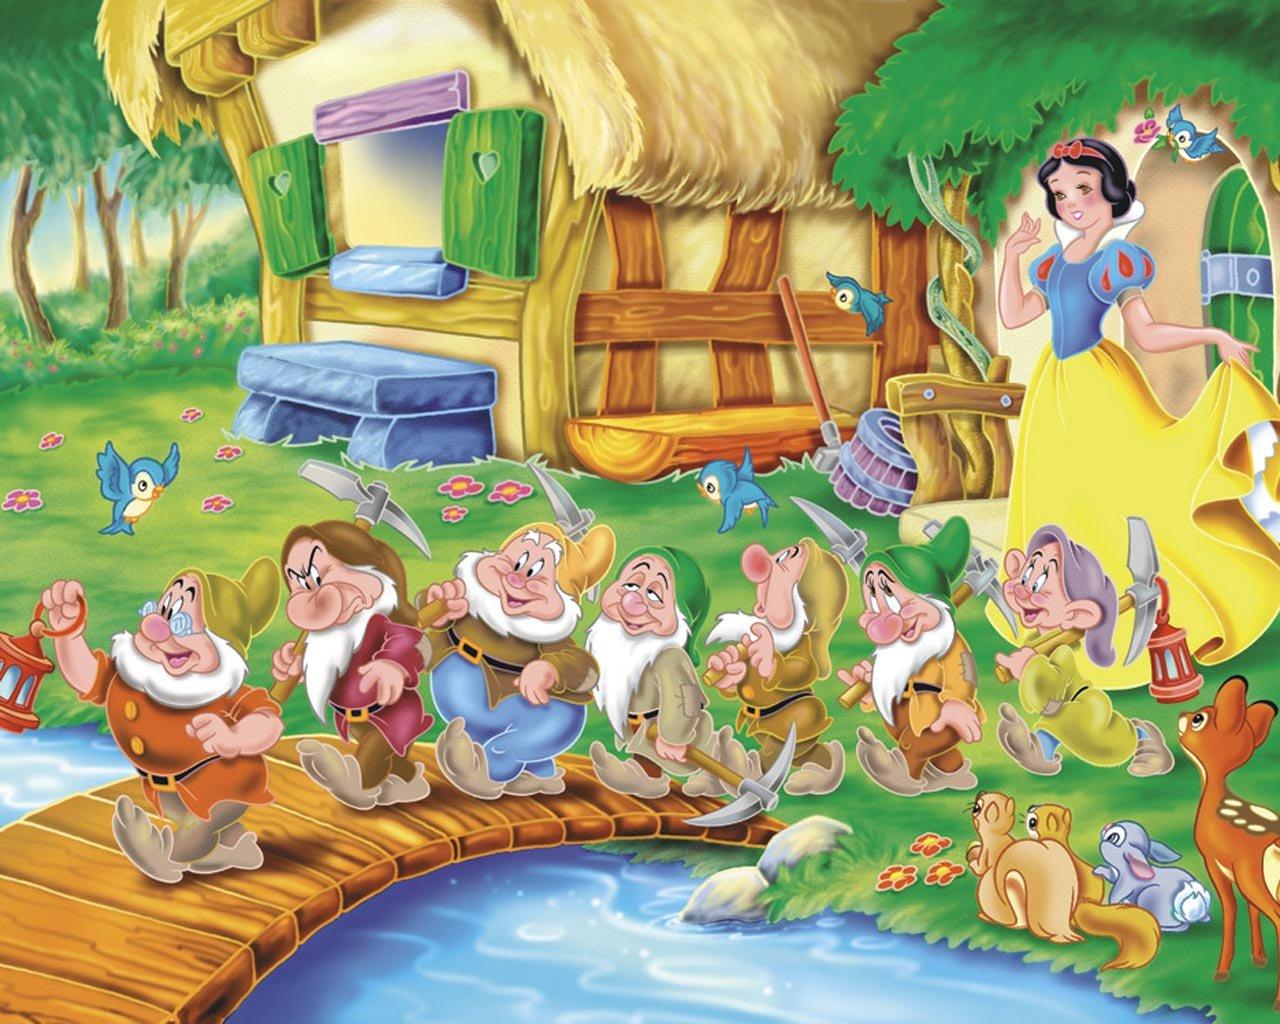 http://2.bp.blogspot.com/-U-E6W2fKLAo/T9s98NhgZ4I/AAAAAAAAGUM/KmBuLzXORSs/s1600/Princess-Snow-White-and-the-Seven-Dwarfs.jpg